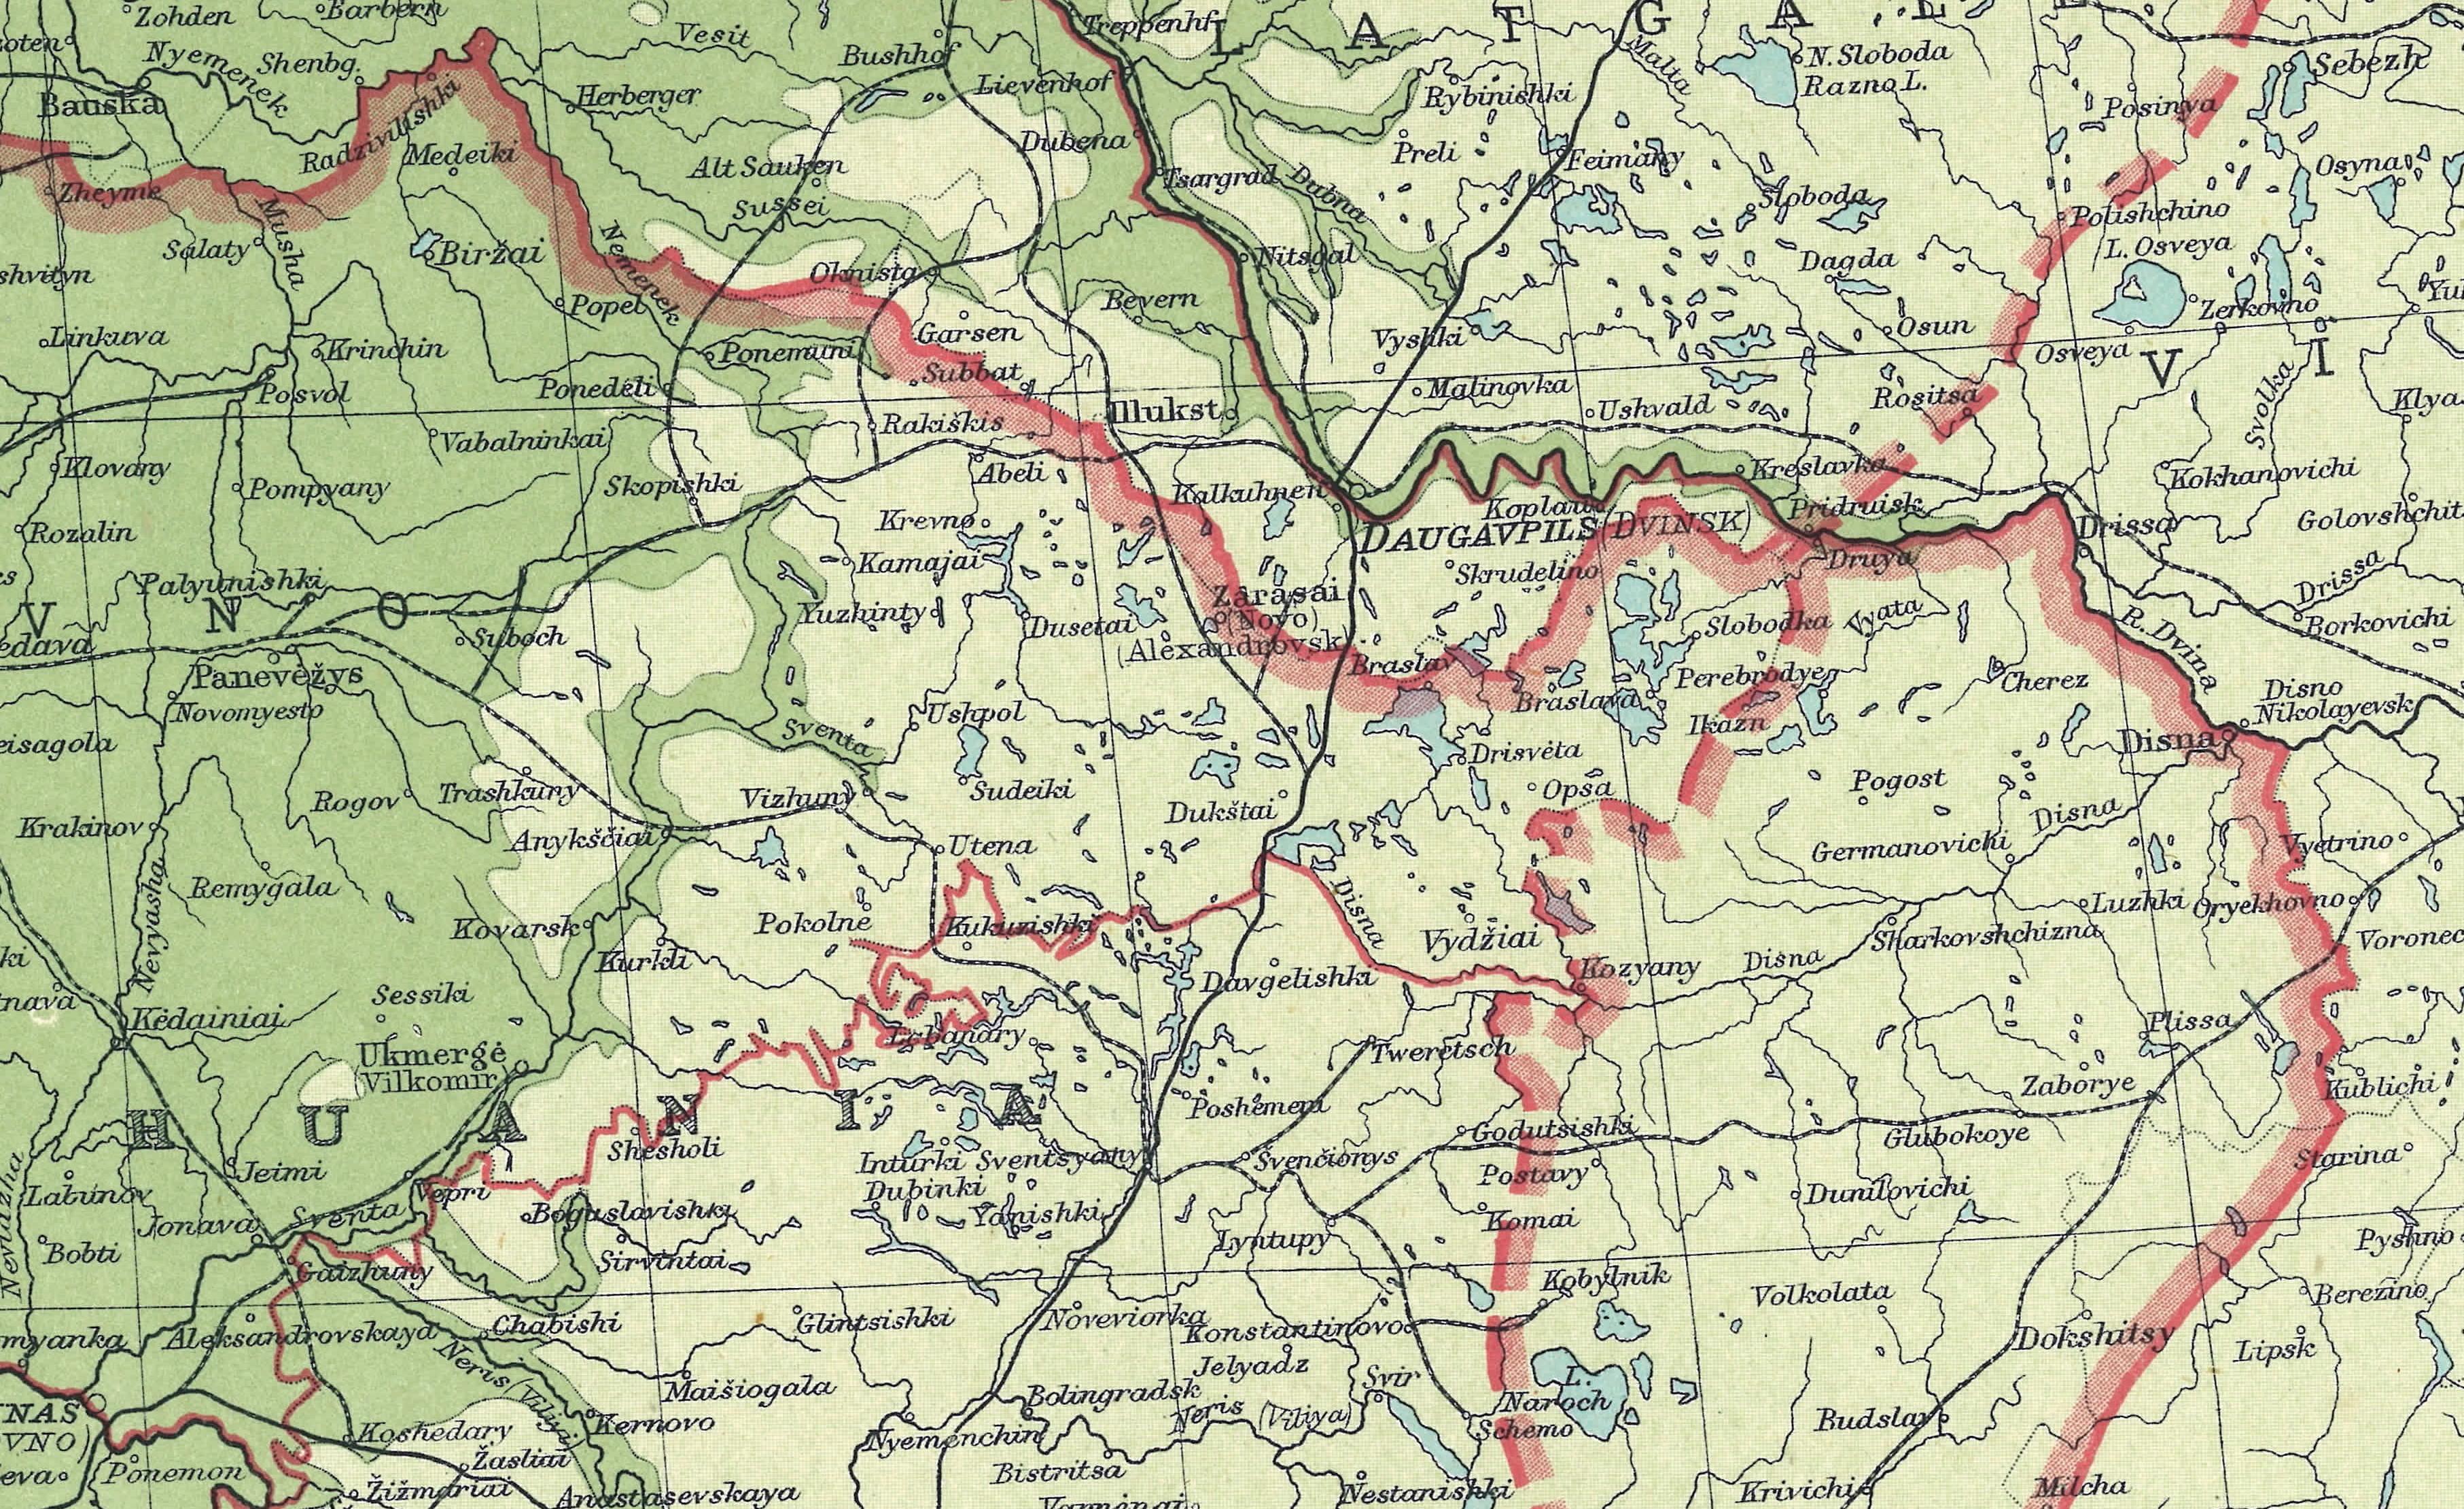 Maps - Bottom half of us map